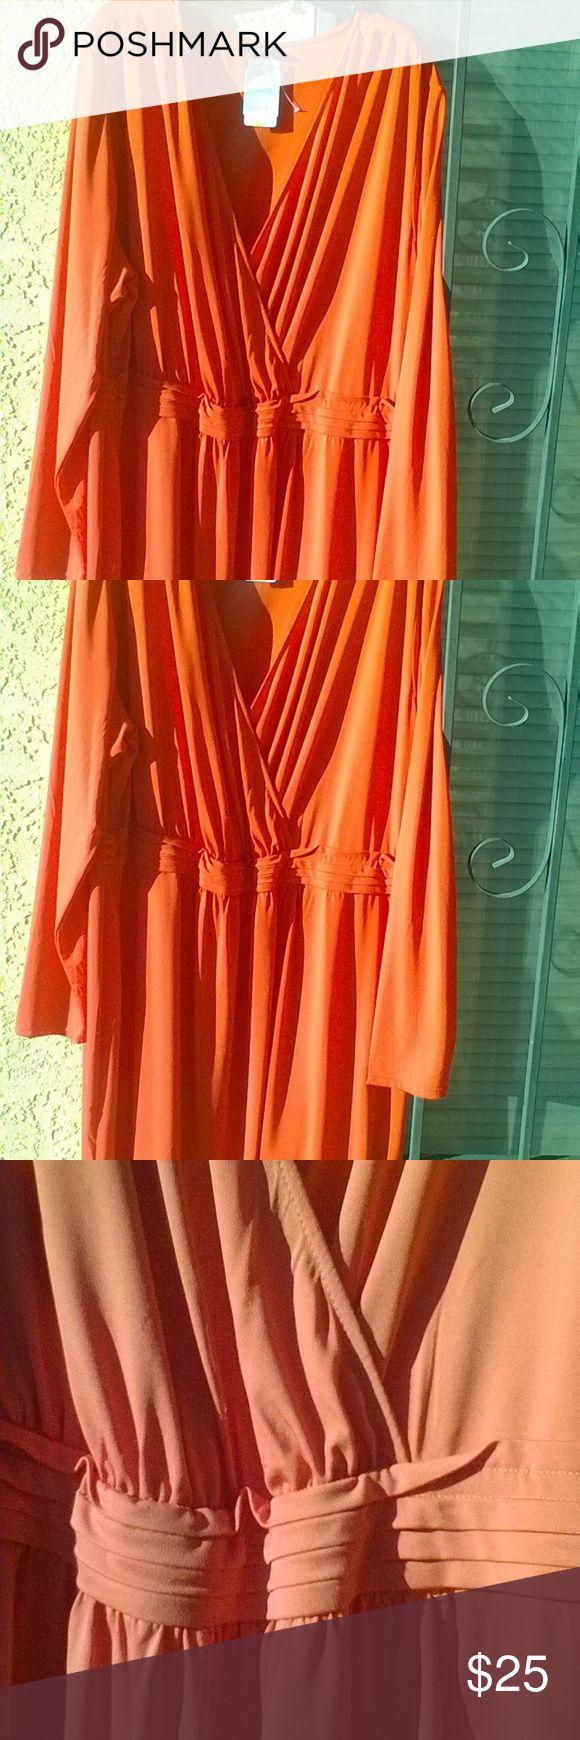 Plus Size 4X Torrid Red Dress Deep V **Host Pick** HOST PICK!! WEEKEND WEAR PART 11/11!!!!!!!!!!!!!!  Plus Size 4X Torrid Red Dress.  Deep V-neck. Lightweight midi length dress.  New with tags. Color: Red. Size 4X. torrid Dresses